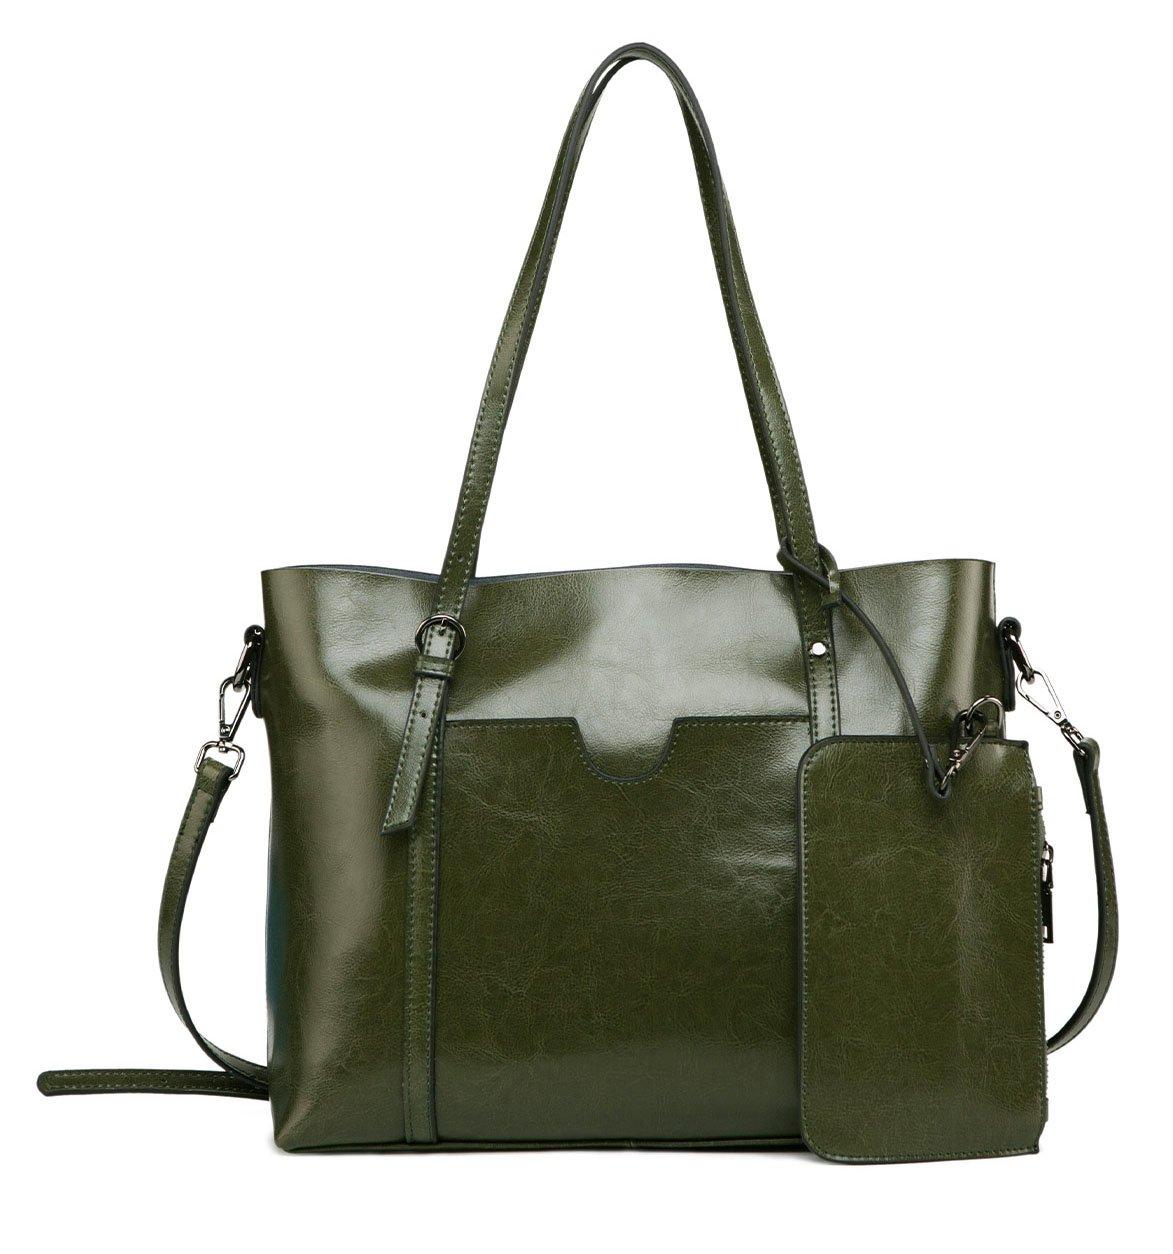 ilishop Genuine Leather Tote Classical Purse Large Capacity Handbag Top Handle Satchel Vogue Cross-bady Shoulder Bag (Armygreen)